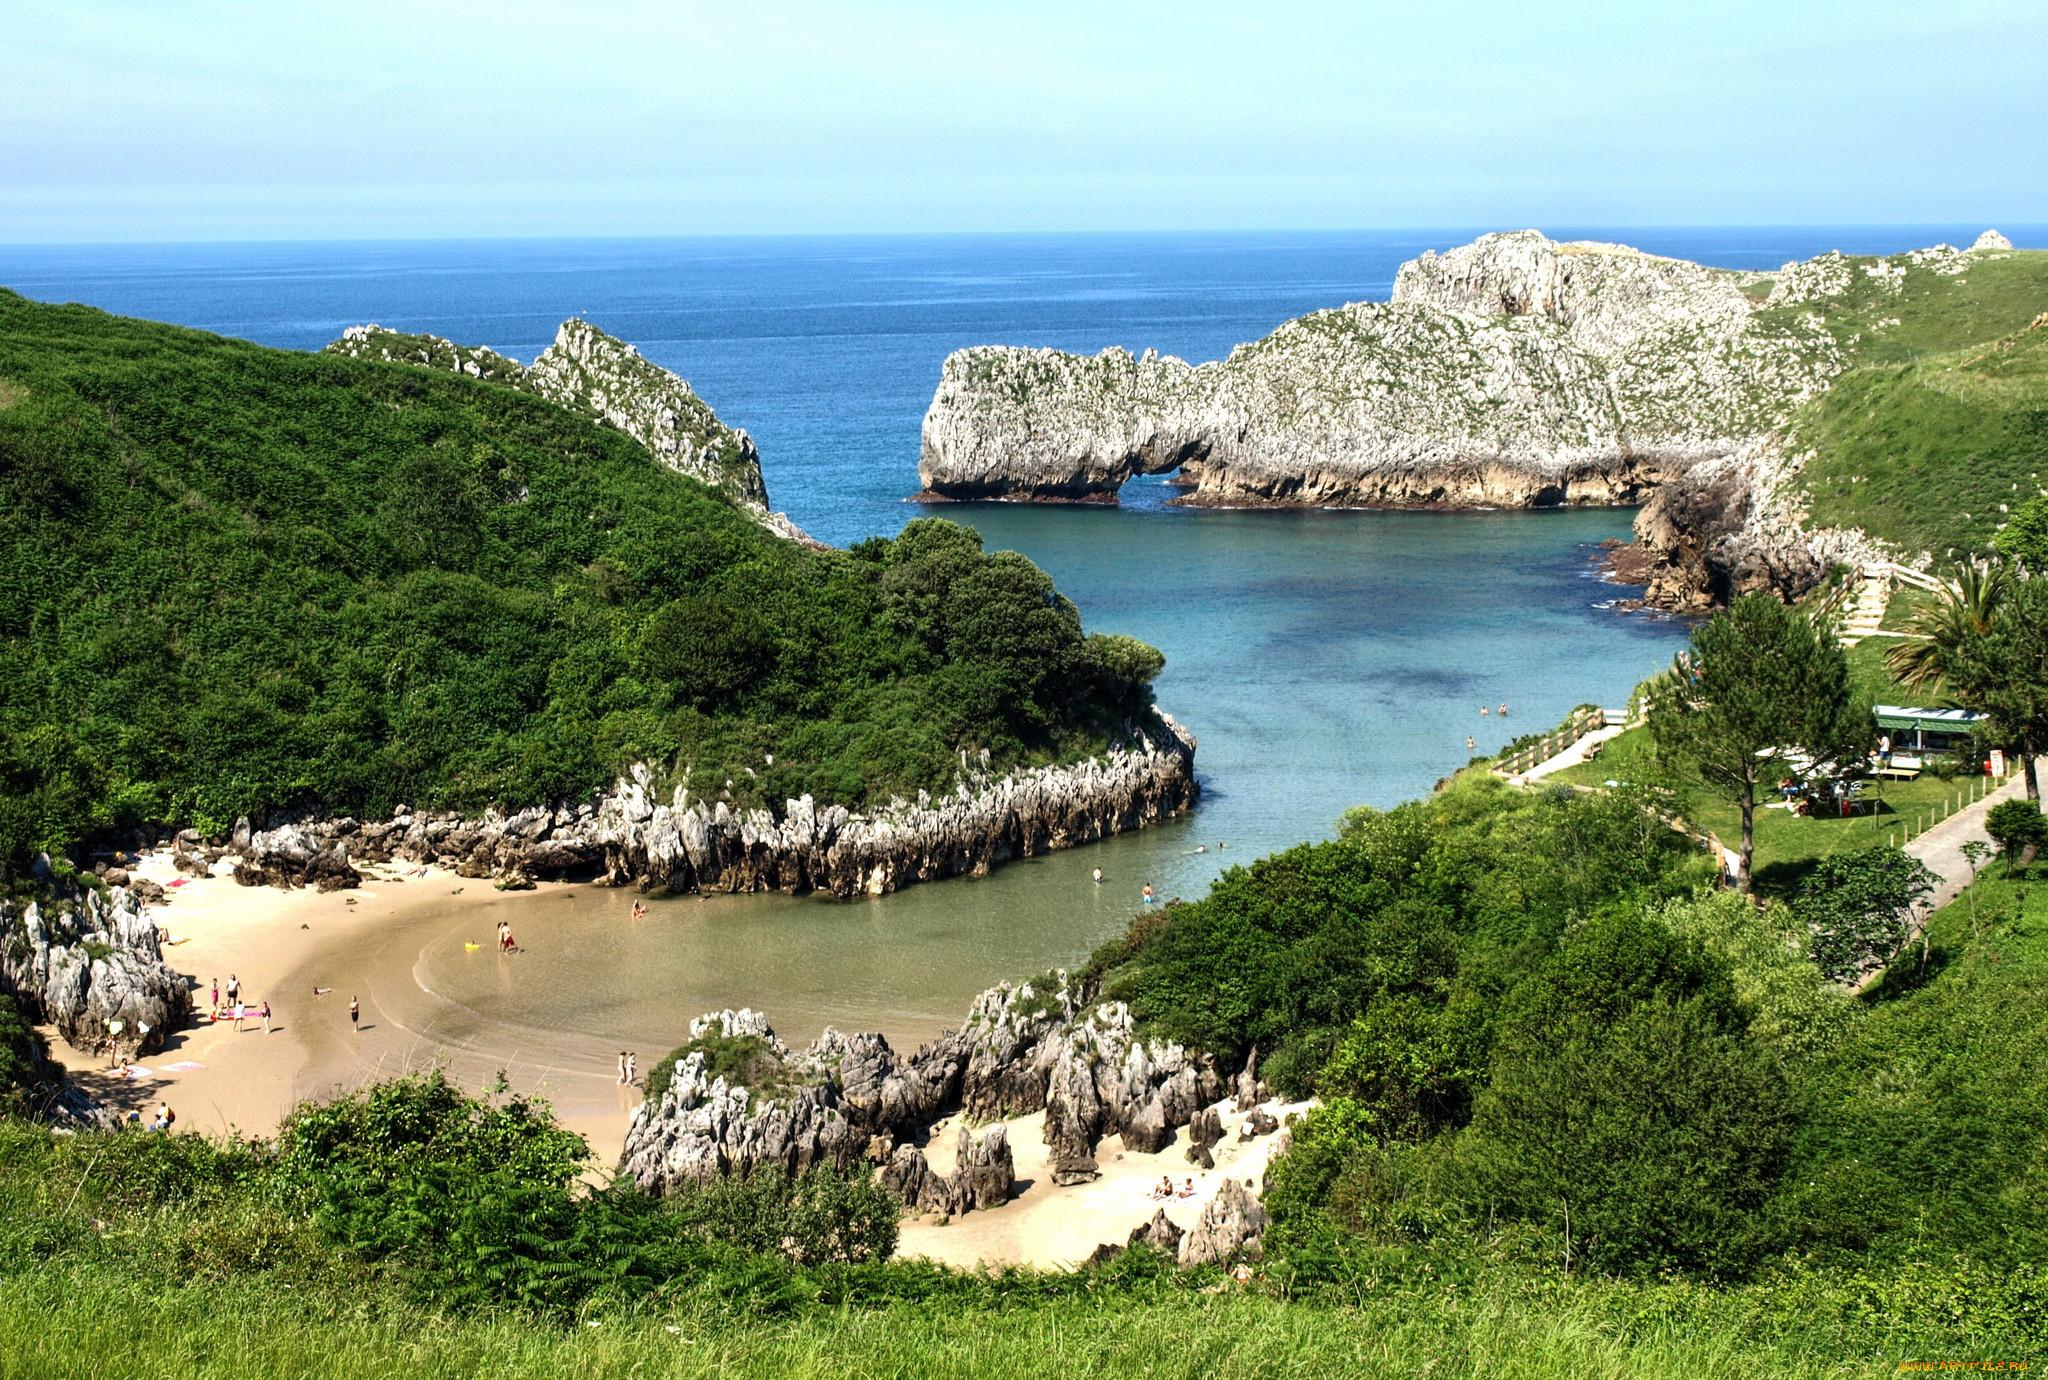 нас можете фото испанских морских берегов слепит его